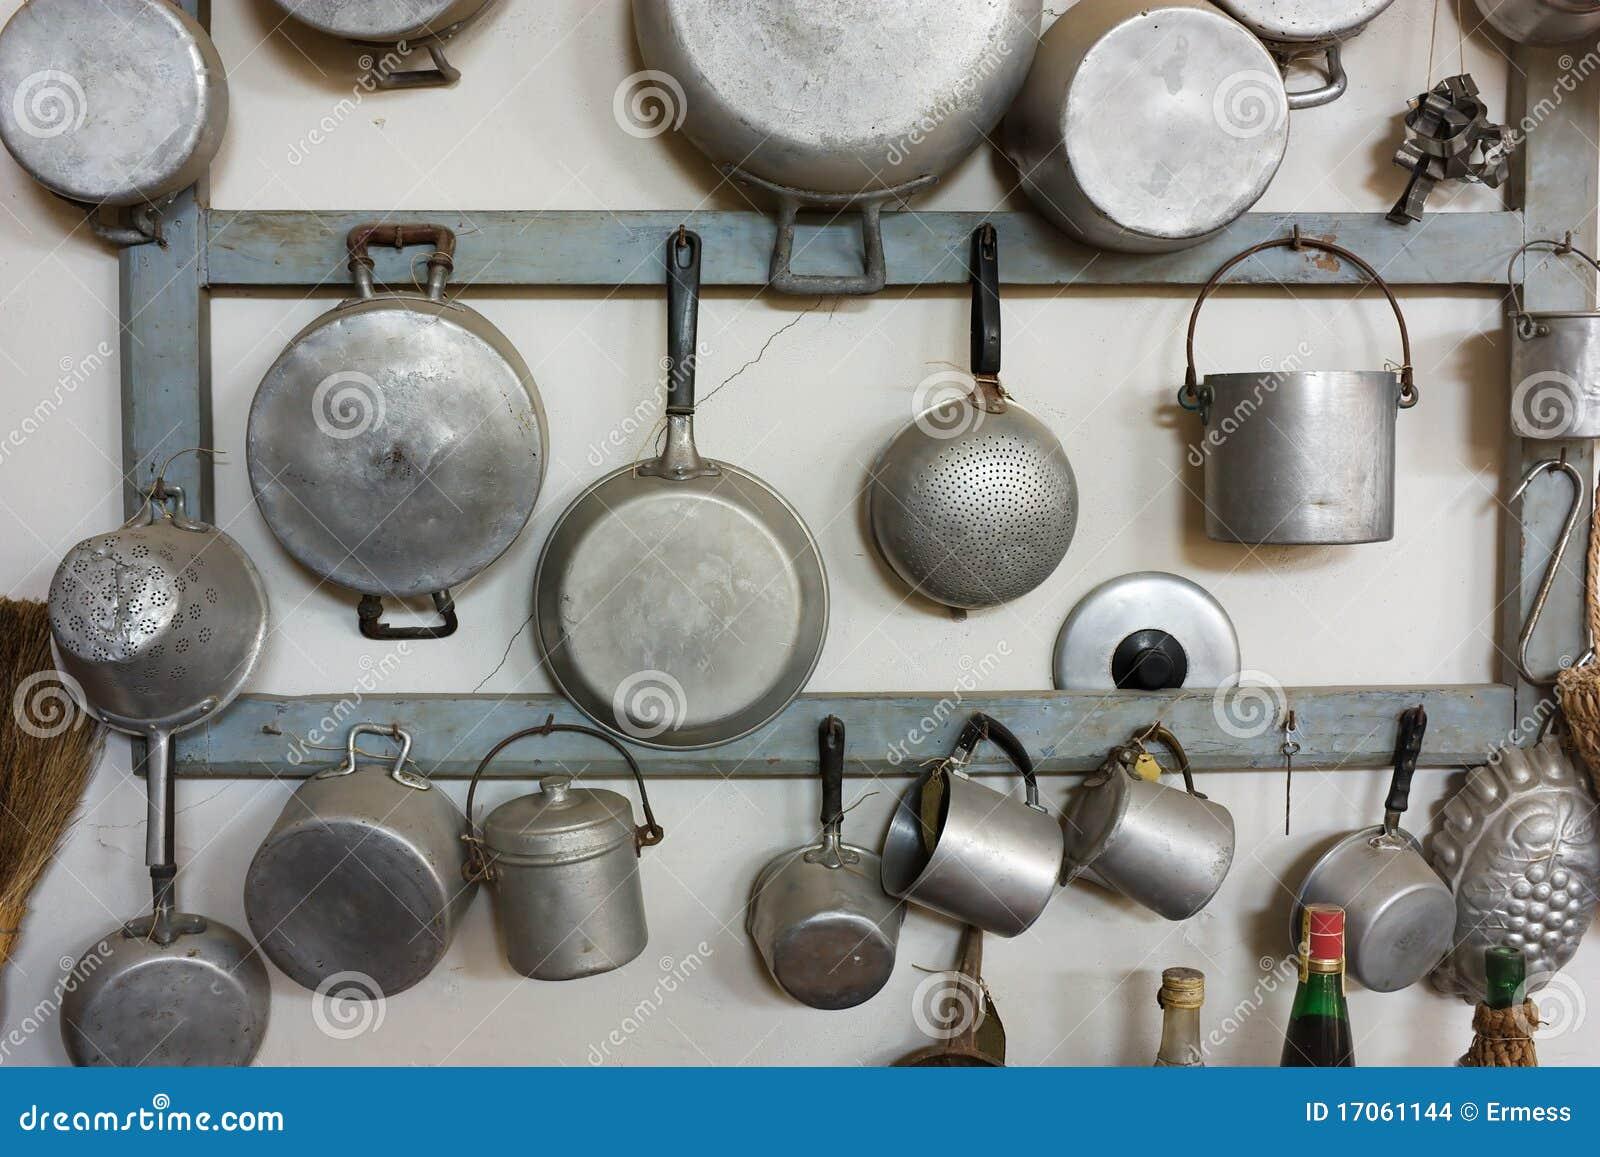 Retro Keukenapparatuur : Reeks oud keukengereedschap – retro apparatuur van grootmoeder het